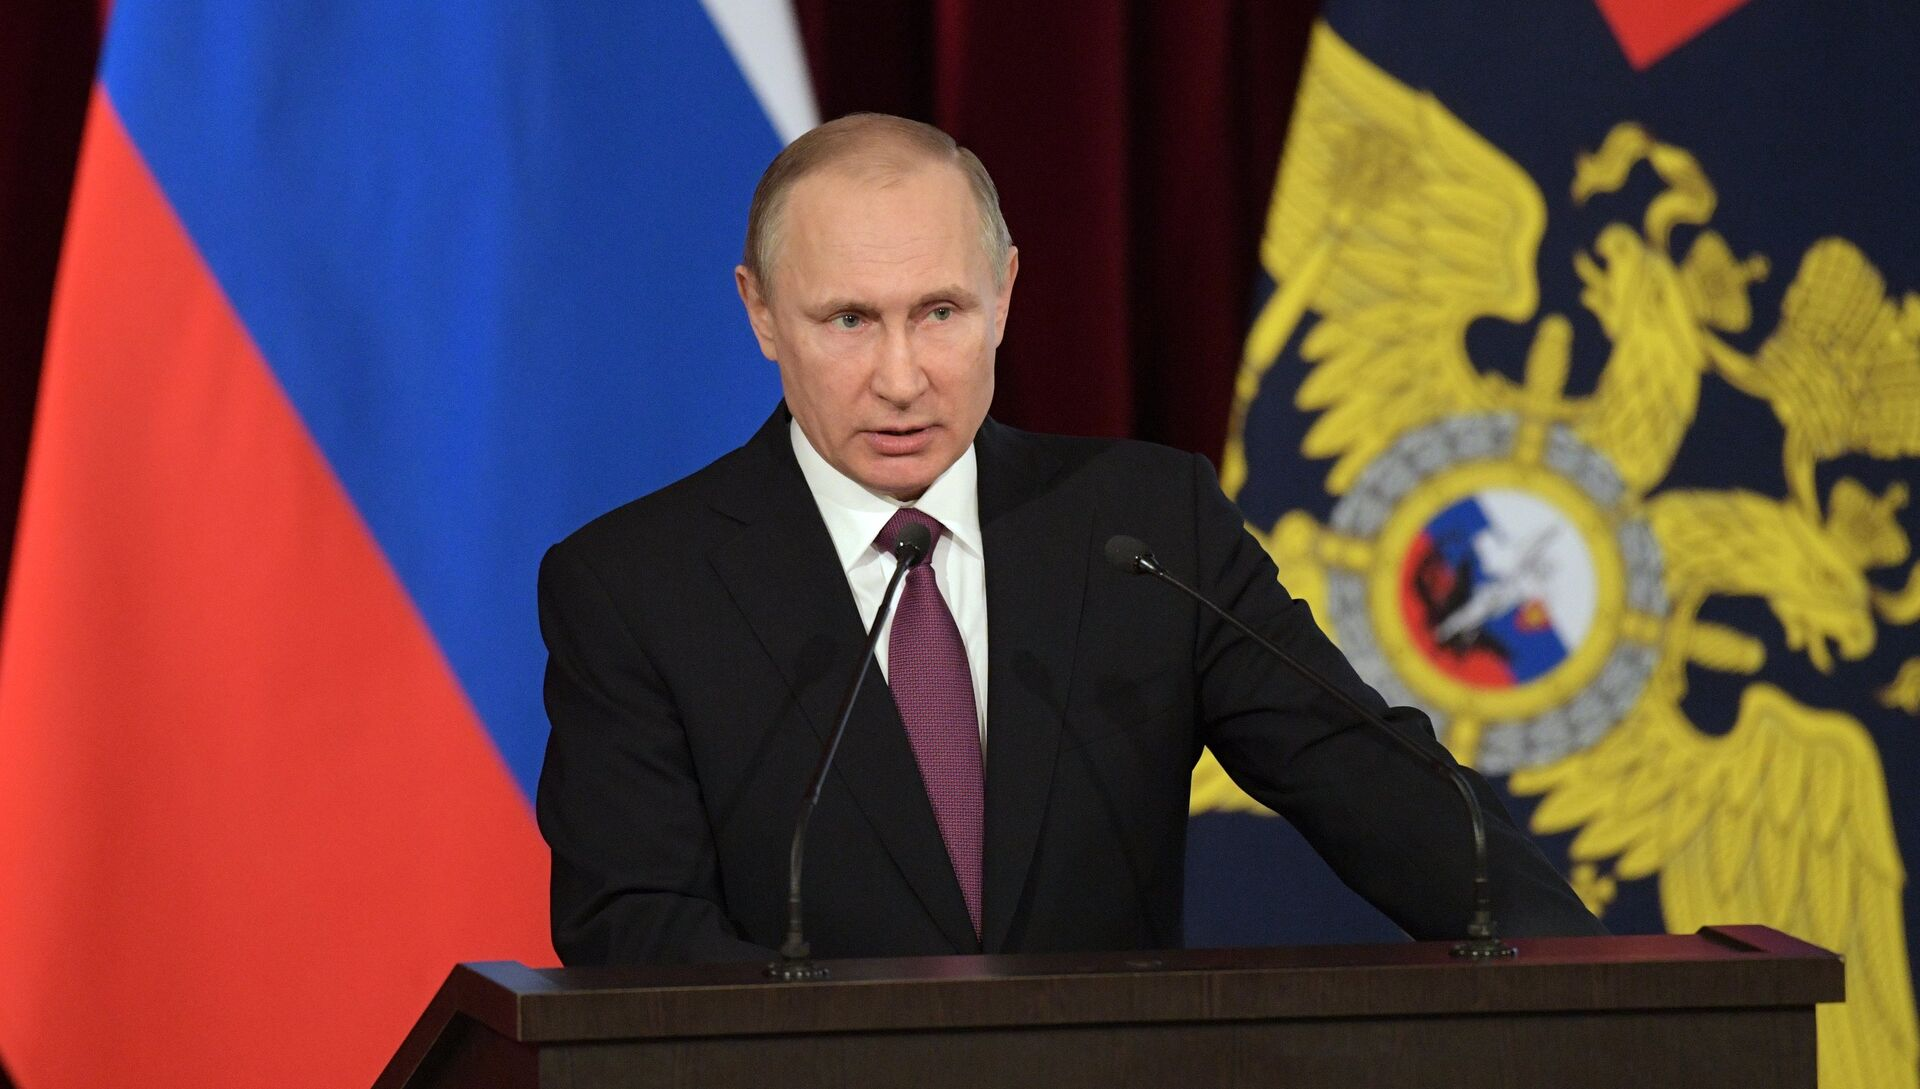 Президент РФ Владимир Путин. Архивное фото - РИА Новости, 1920, 20.03.2017